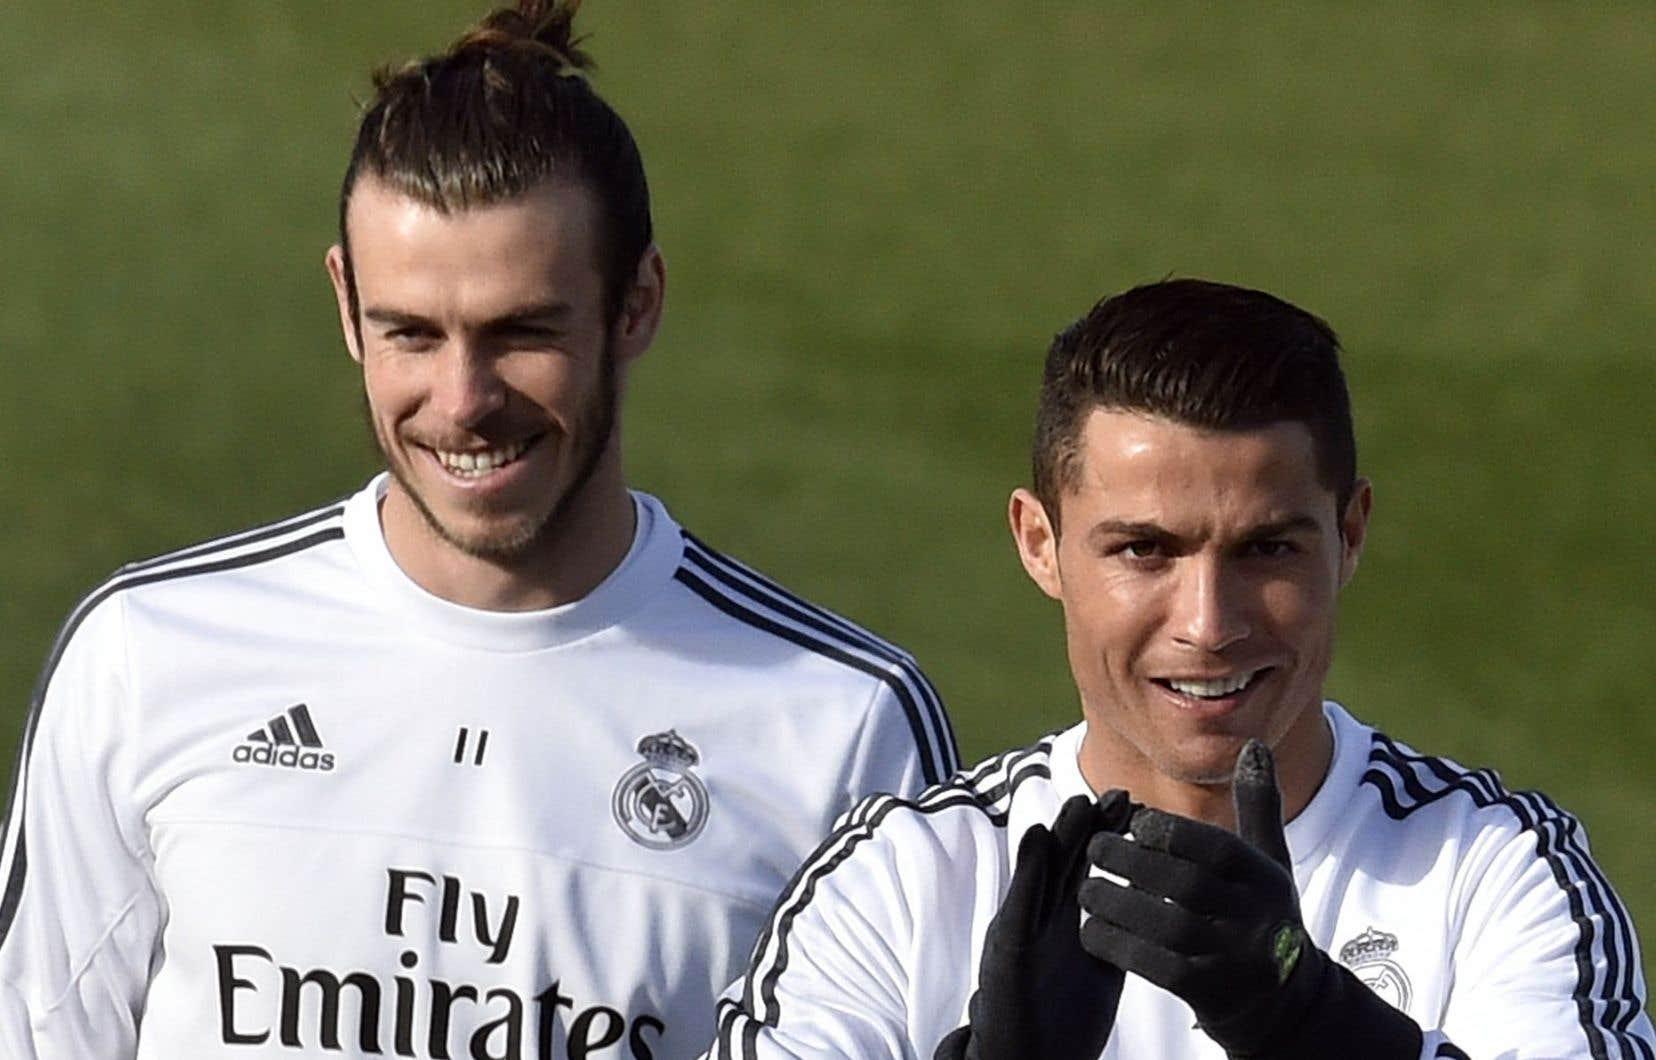 Les attaquants Gareth Bale et Cristiano Ronaldo sont coéquipiers au sein du Real Madrid.